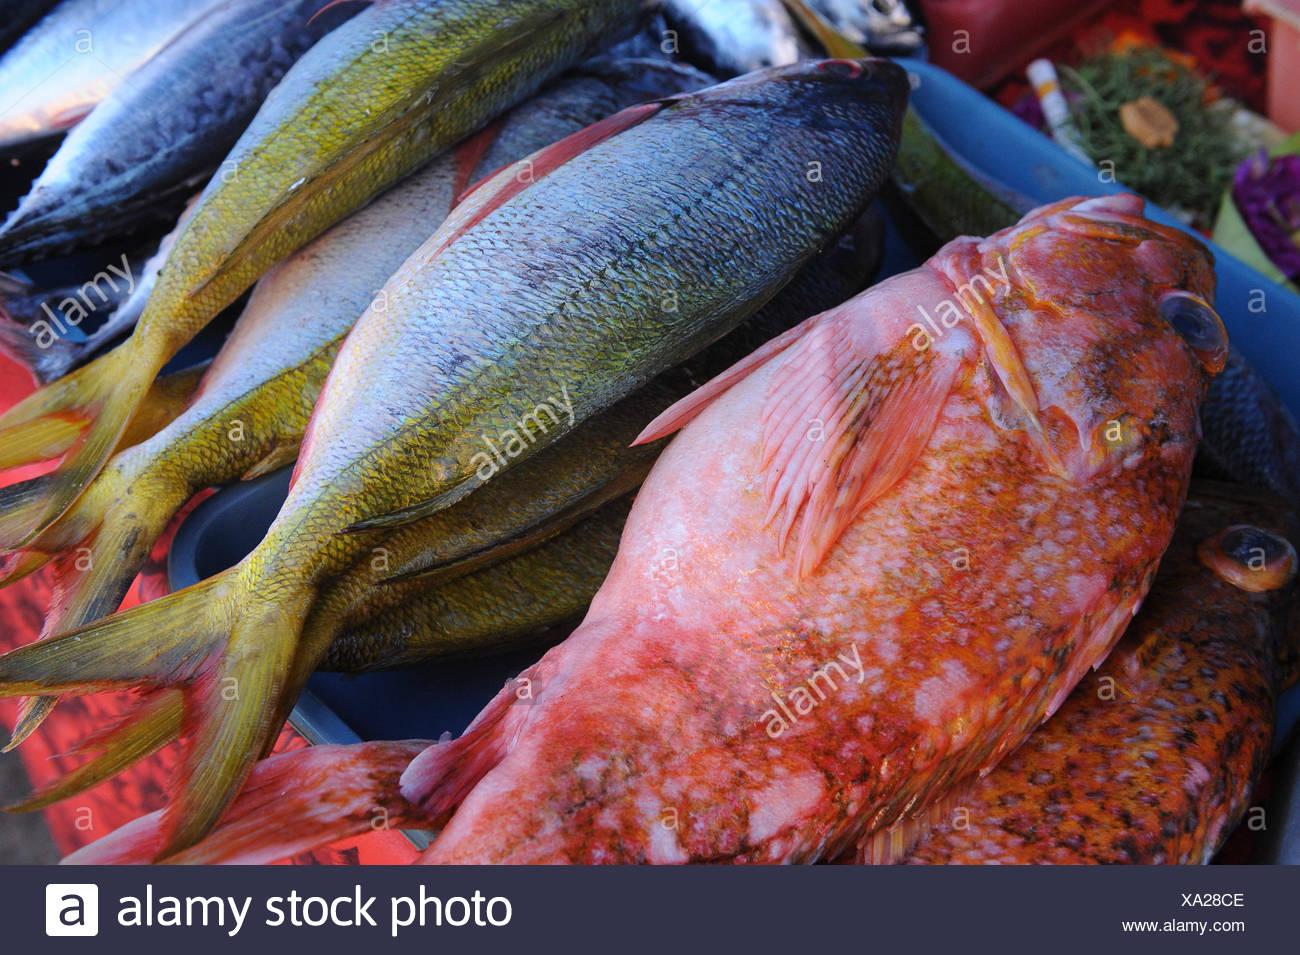 Indonesia, Bali, Denpasar, the market. Multicolored fish Stock Photo ...